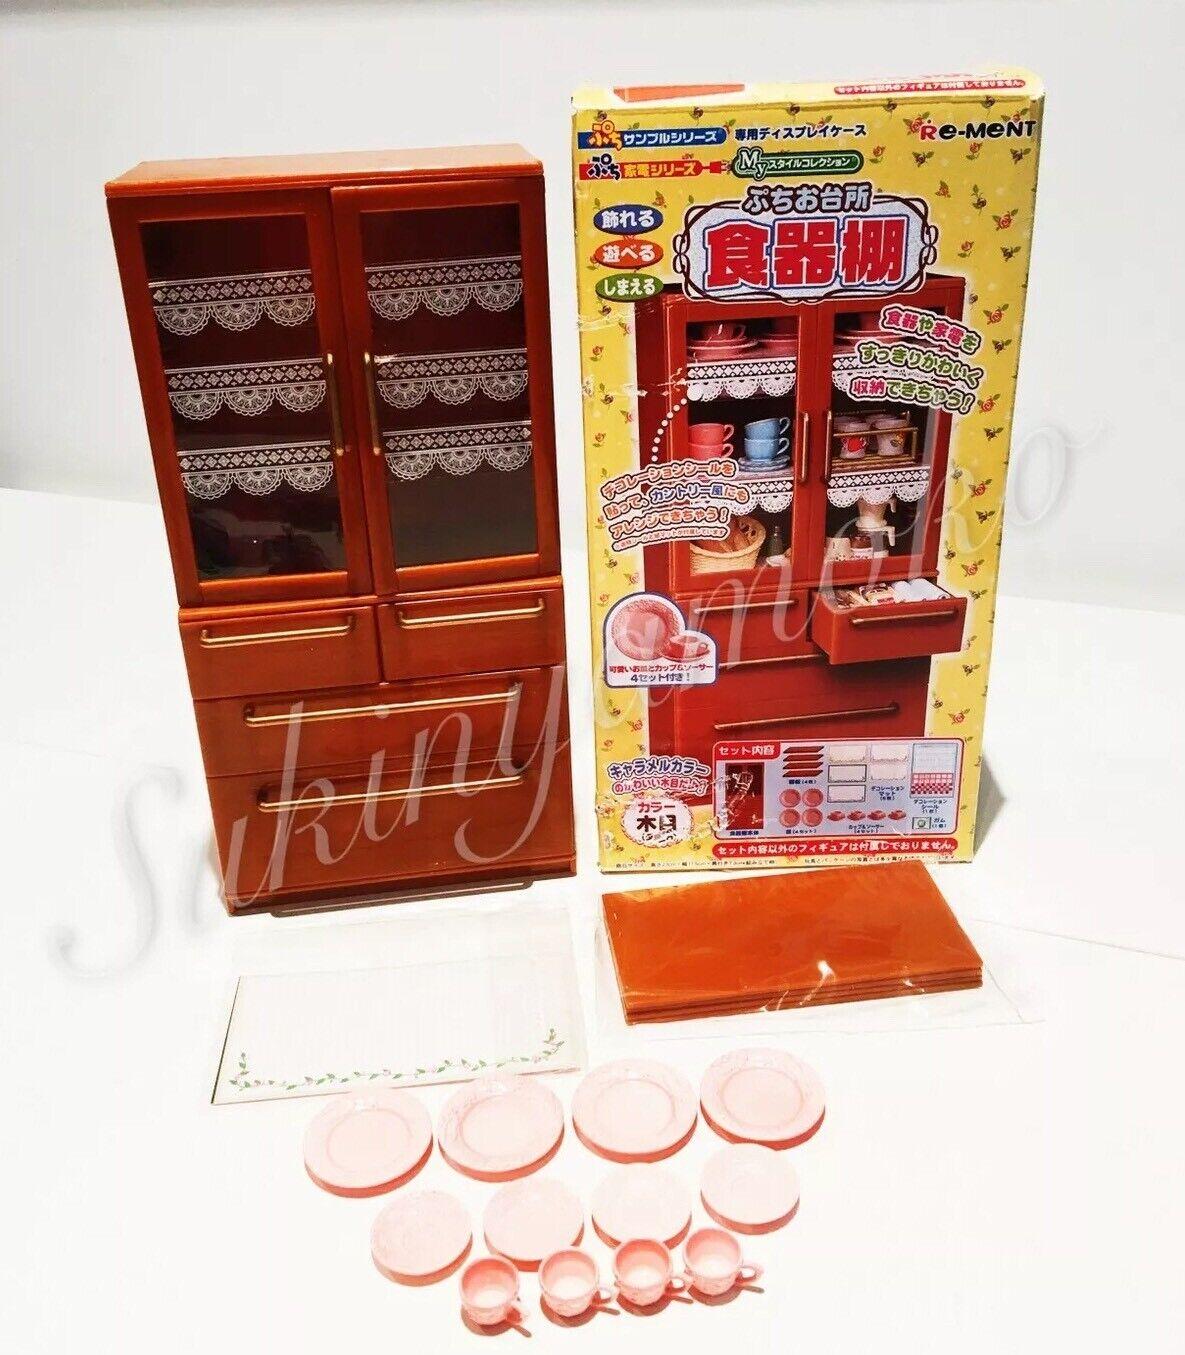 Petit Sample Series  Cabinet Display   Petit Your Kitchen Cupboard (grain)   les promotions